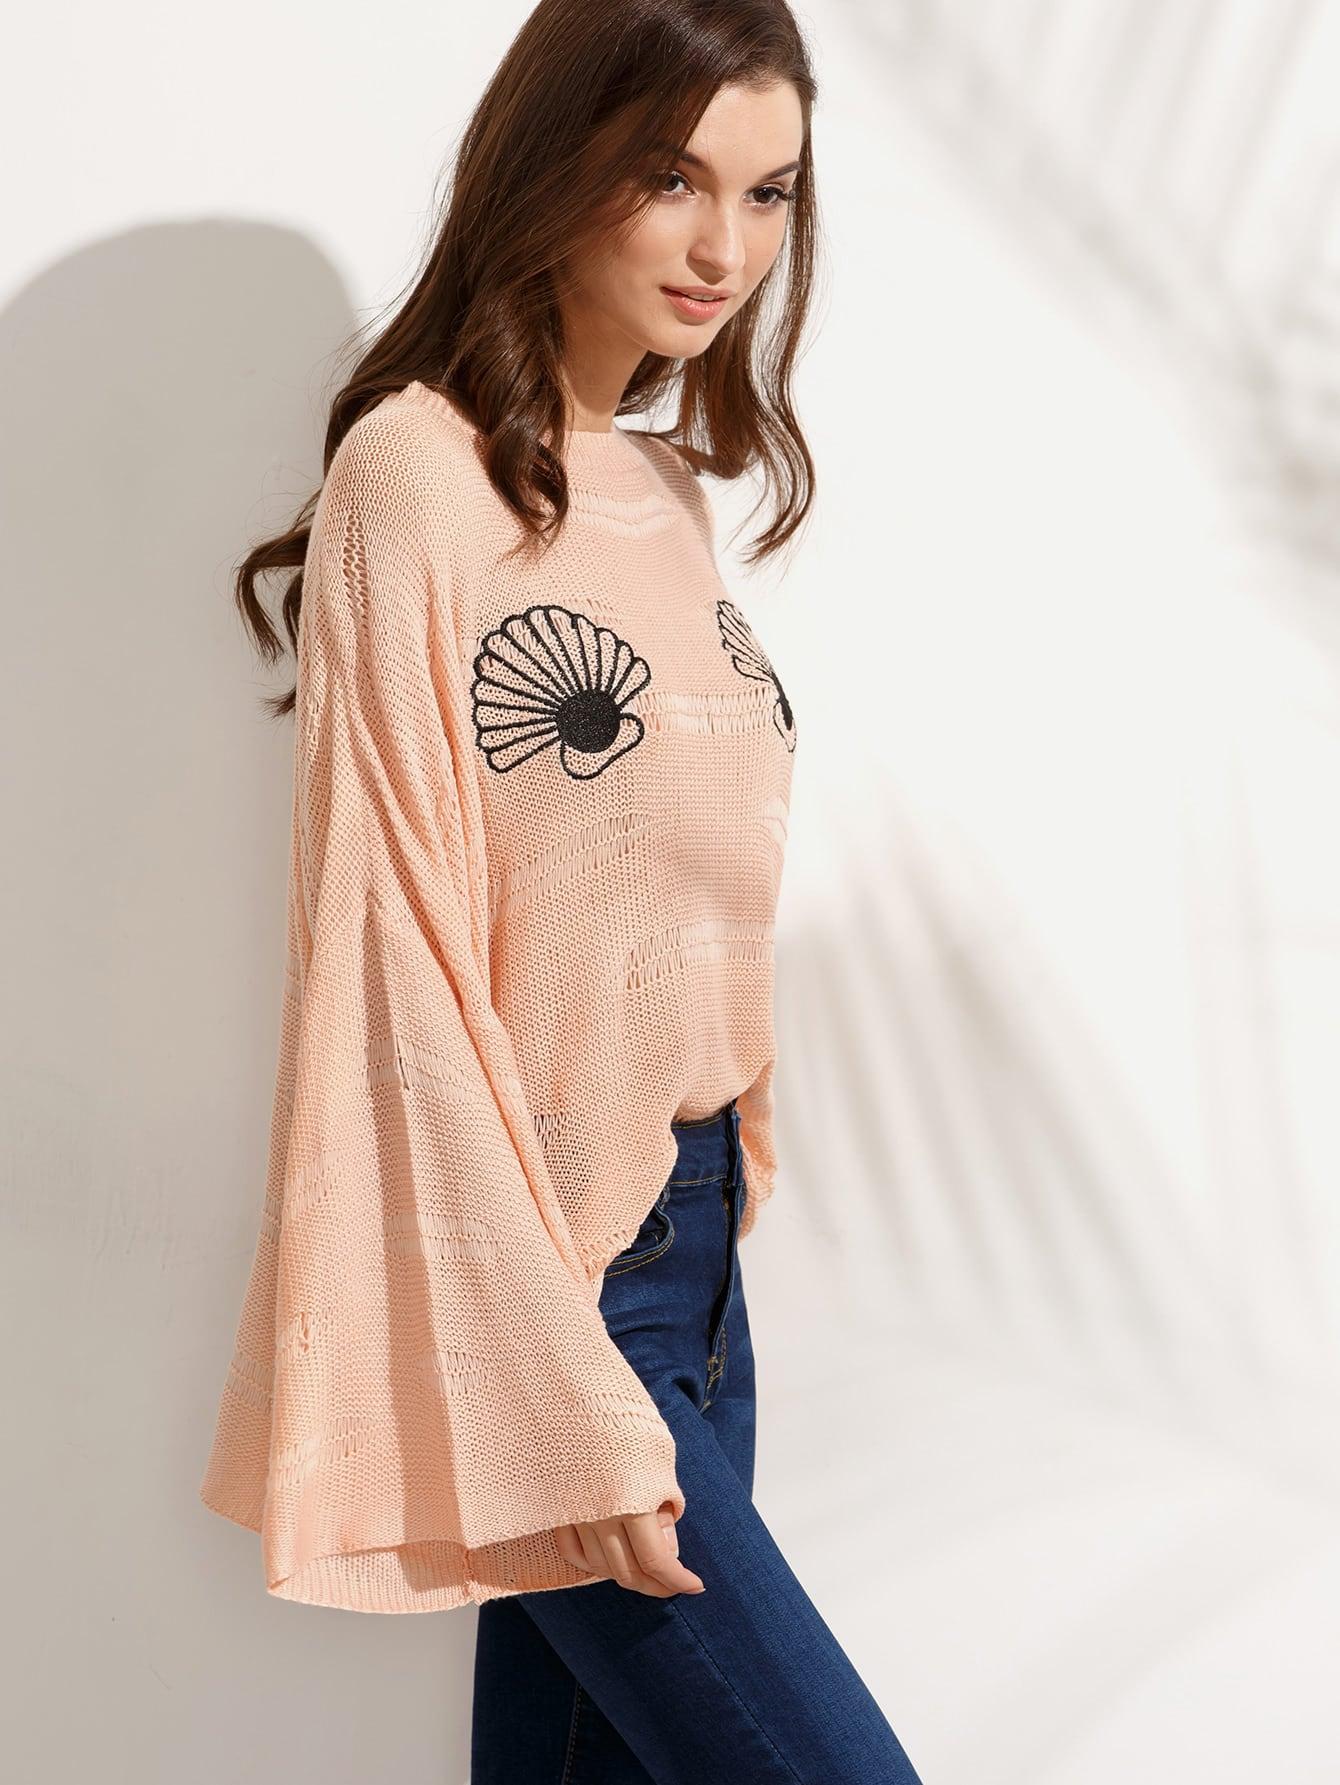 sweater160802736_6